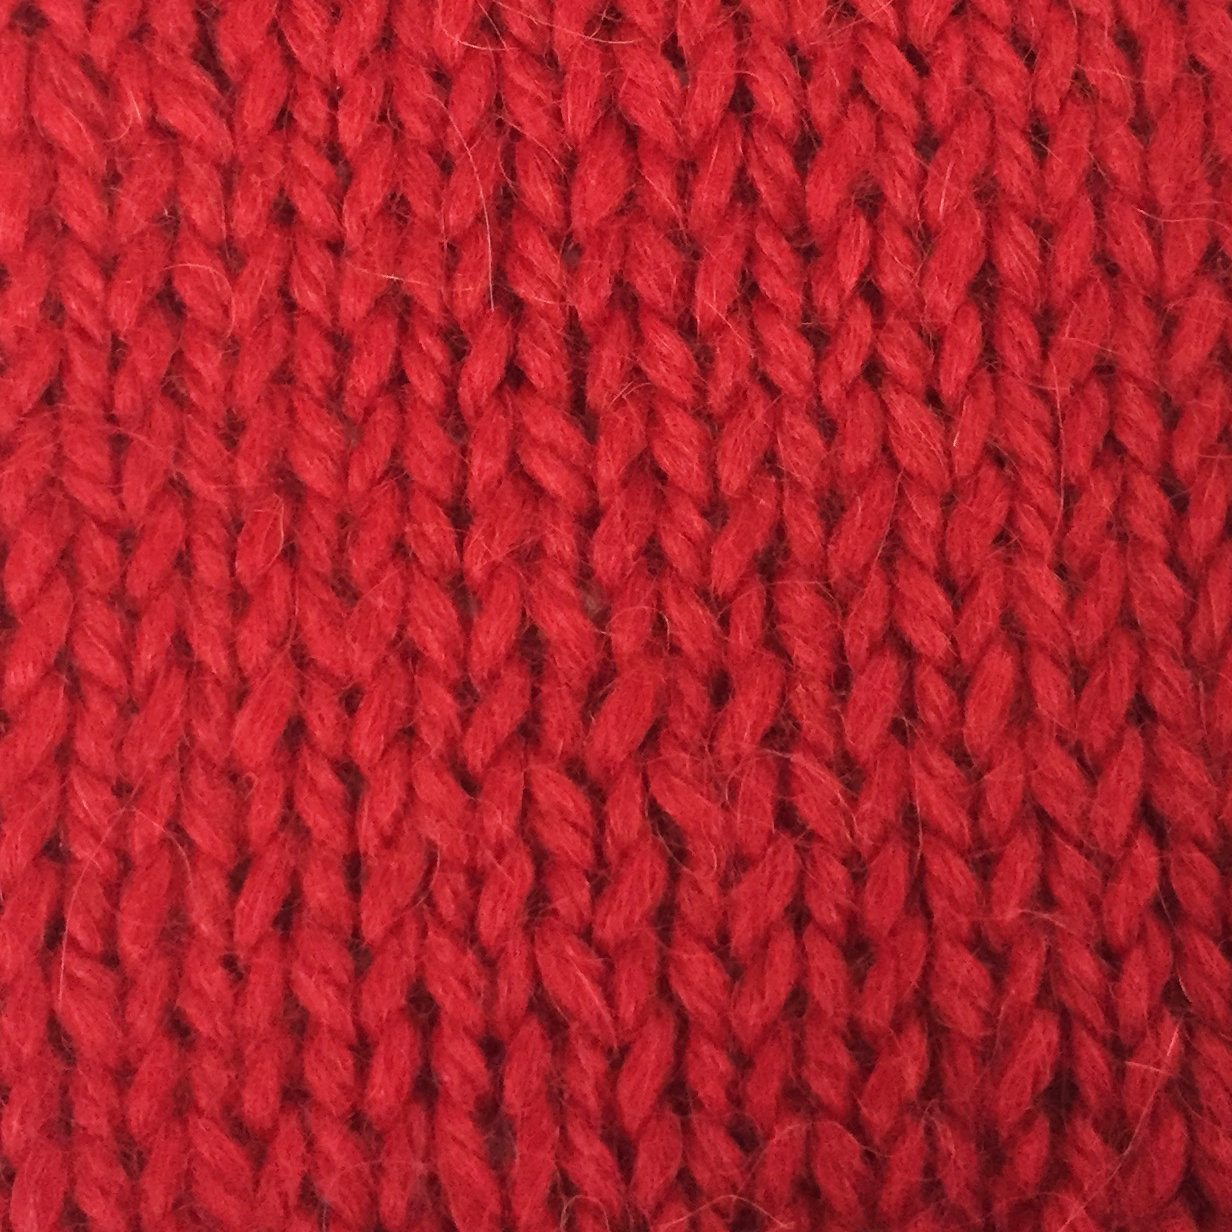 Snuggle Bulky Alpaca Blend Yarn - Jubilee AYC-6060